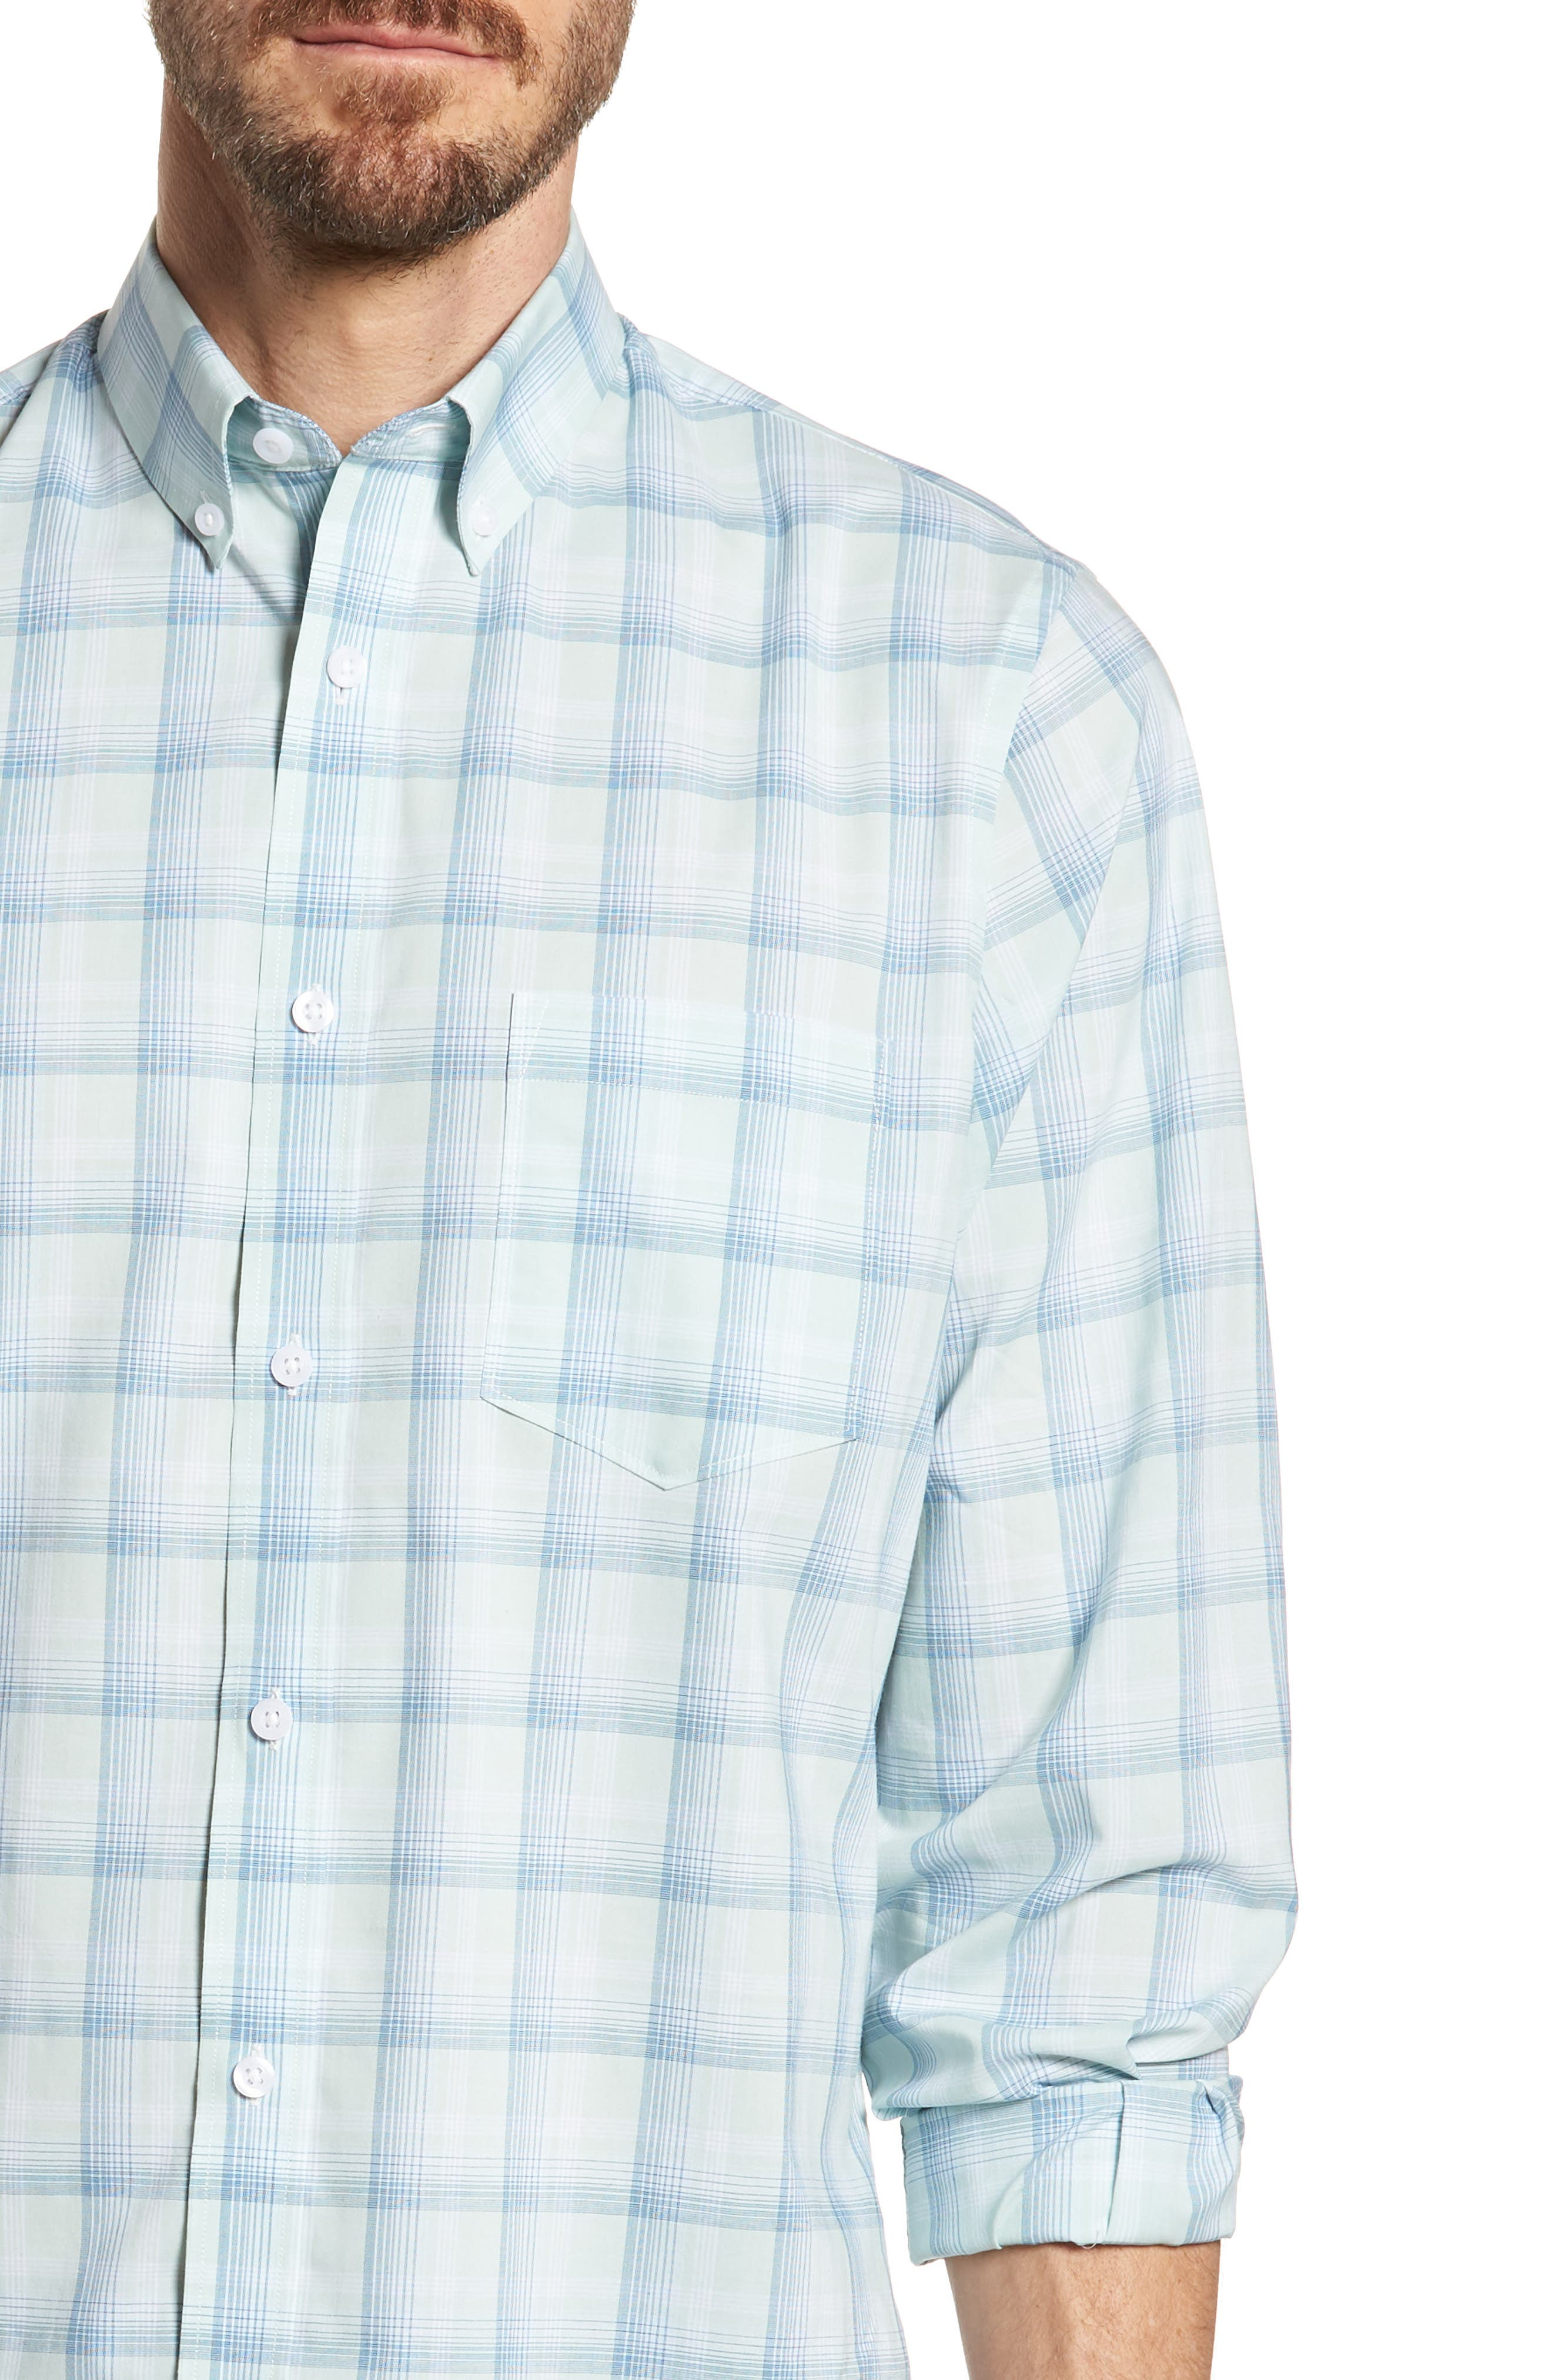 Tech-Smart Regular Fit Plaid Sport Shirt,                             Alternate thumbnail 2, color,                             Teal Surf Blue Plaid